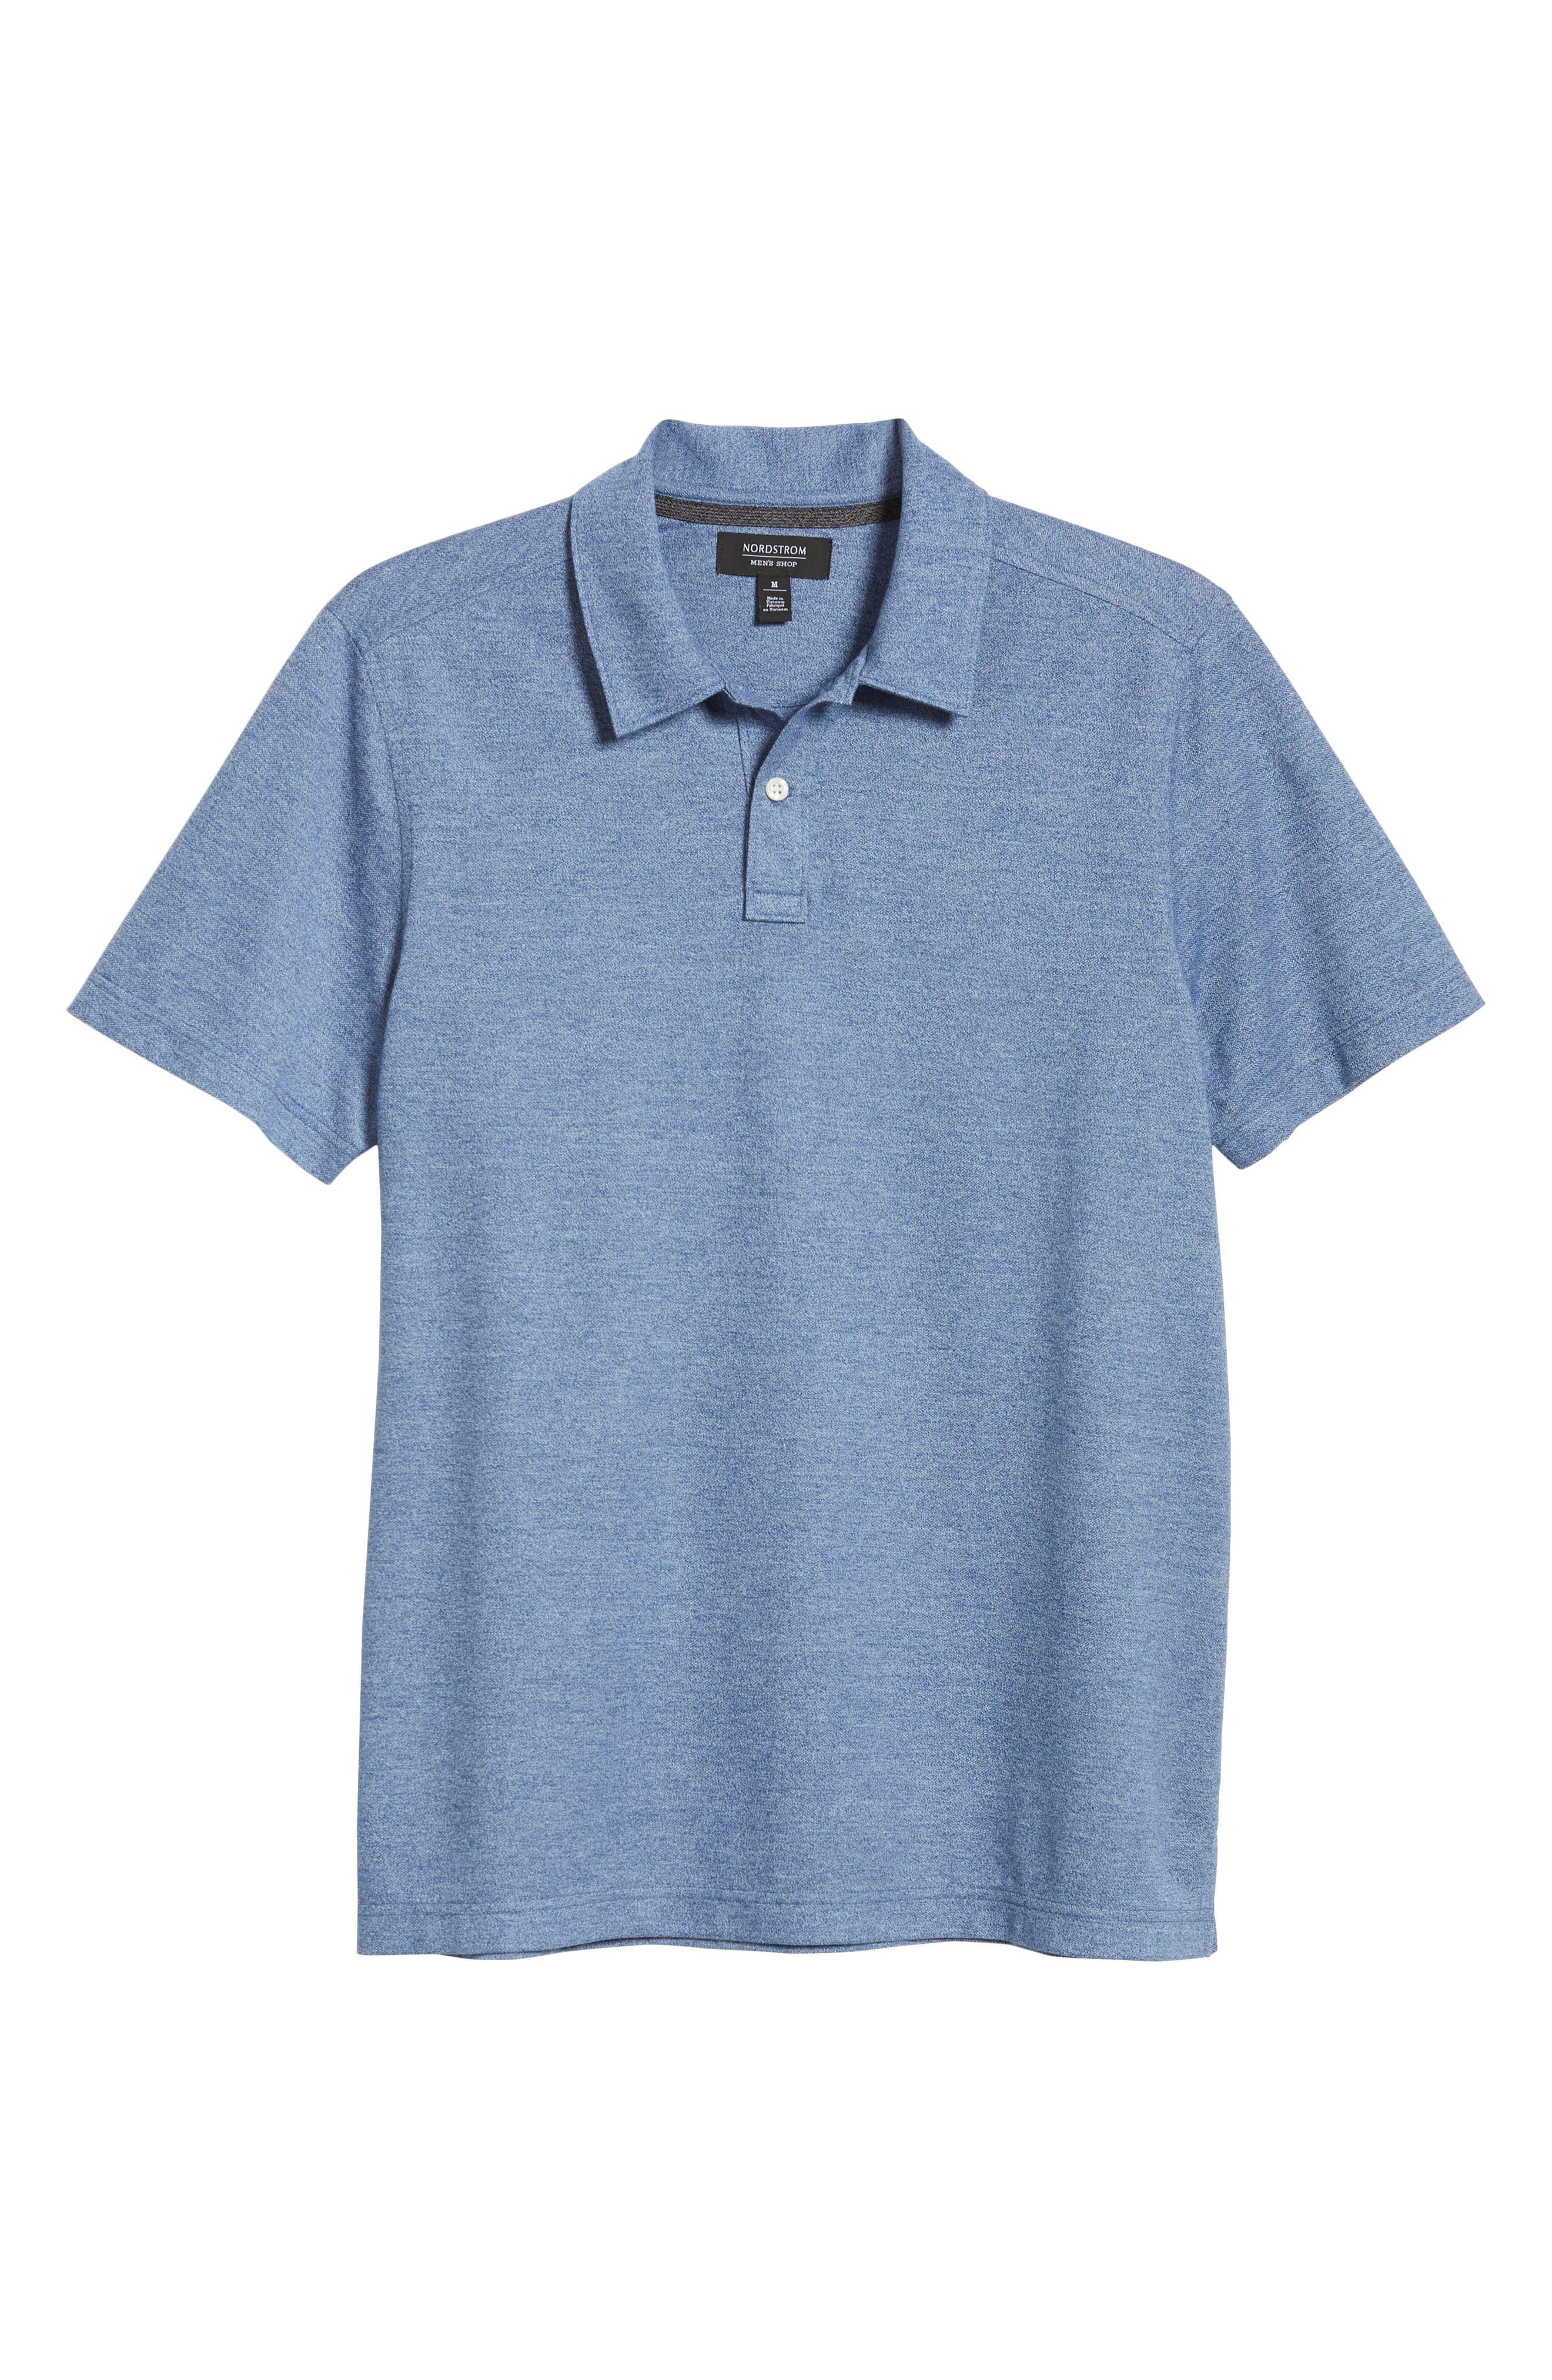 NORDSTROM MEN'S SHOP, Regular Fit Polo, Alternate thumbnail 6, color, BLUE CASPIA MELANGE